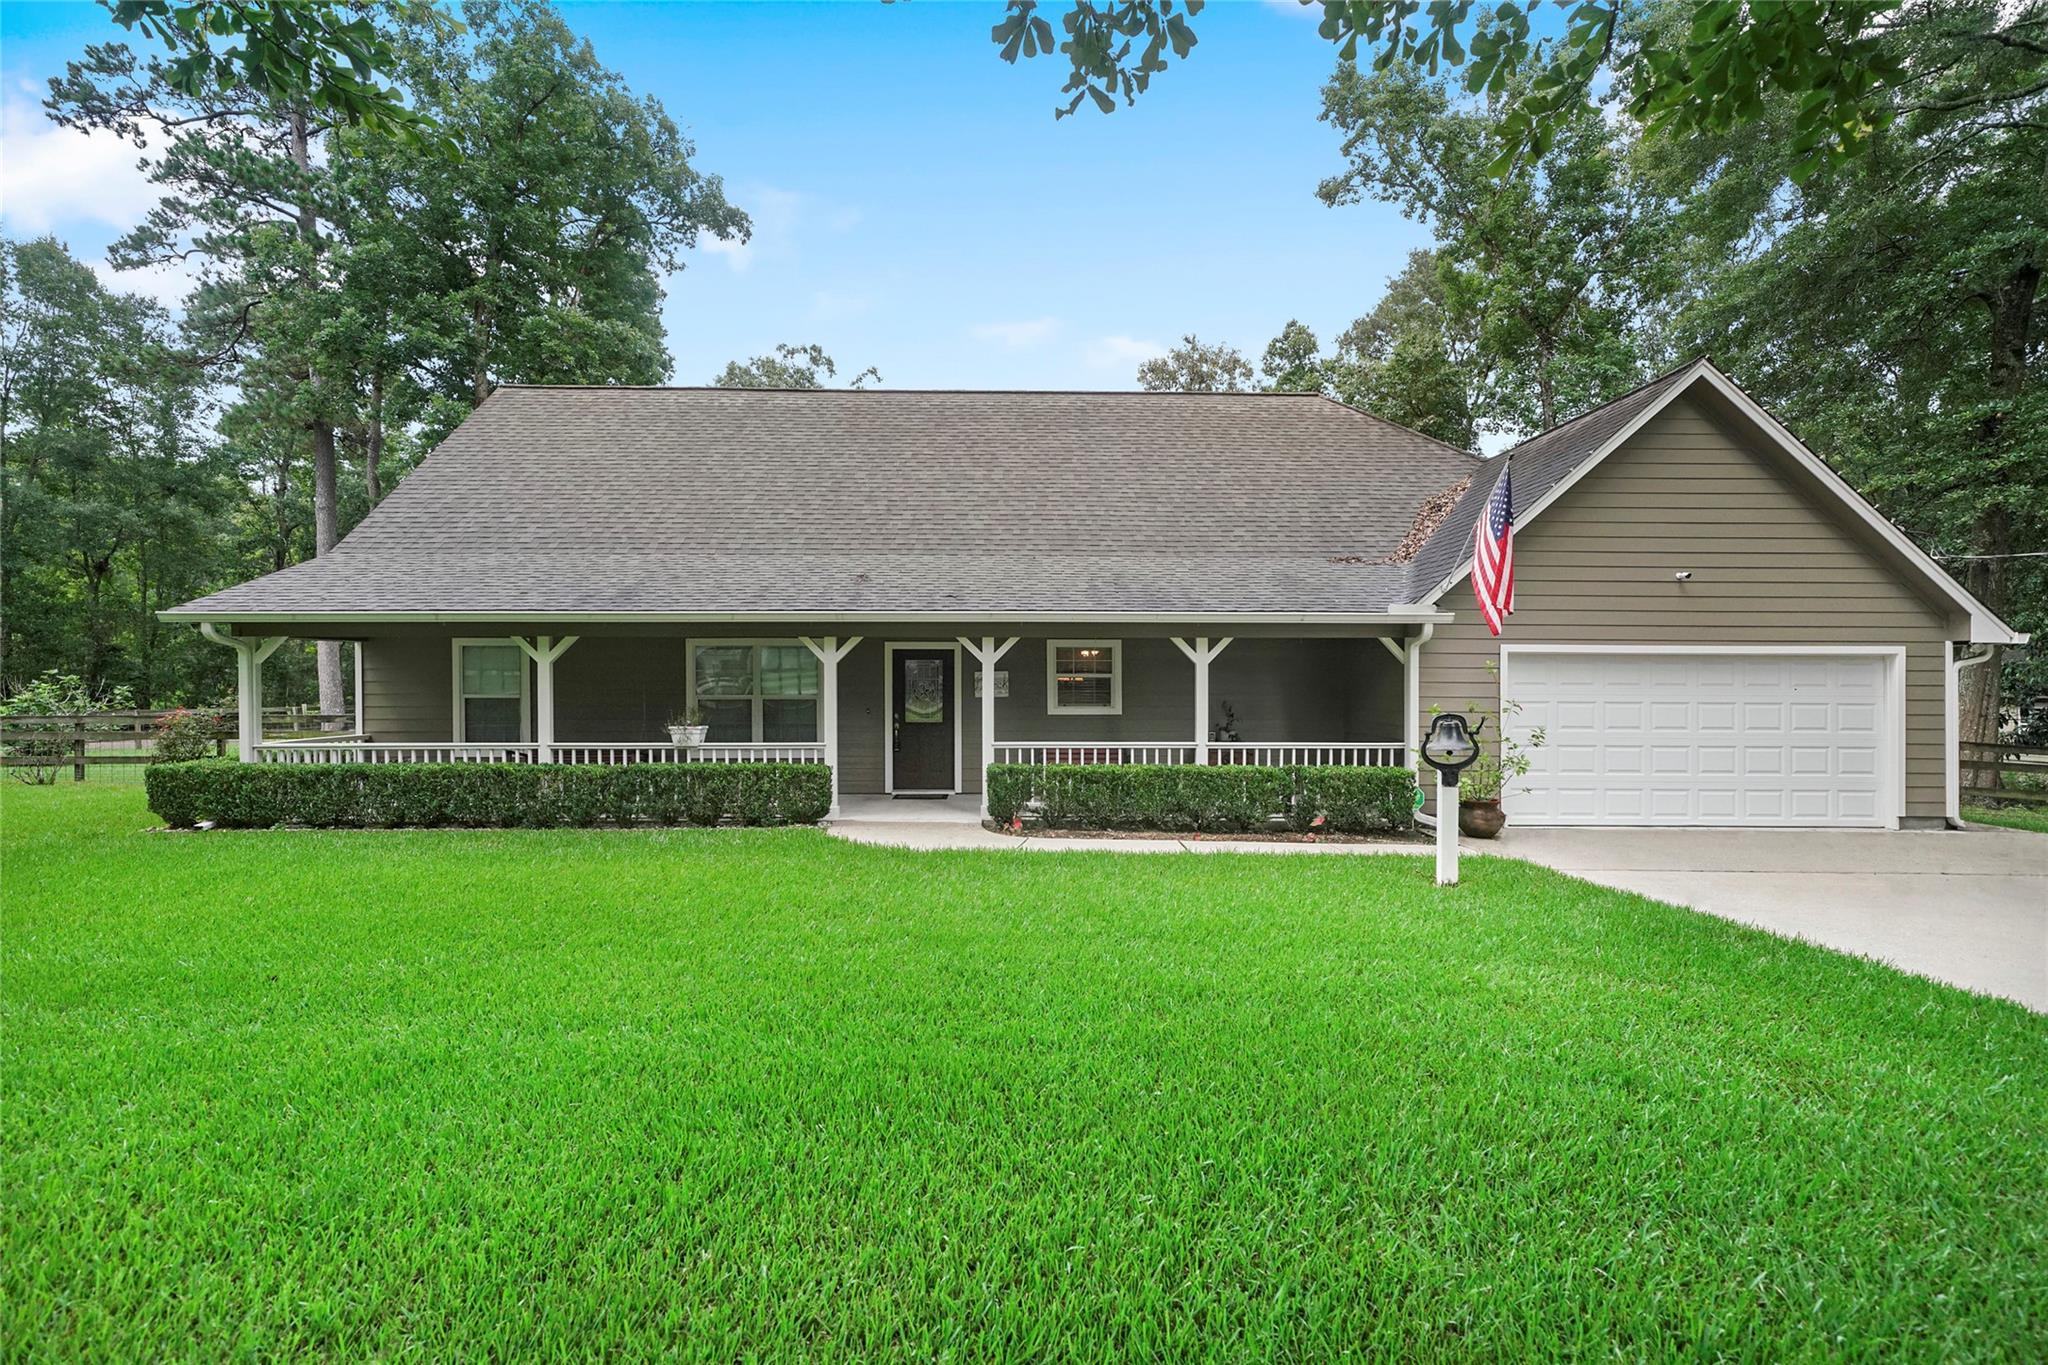 10947 N Woods Property Photo 1